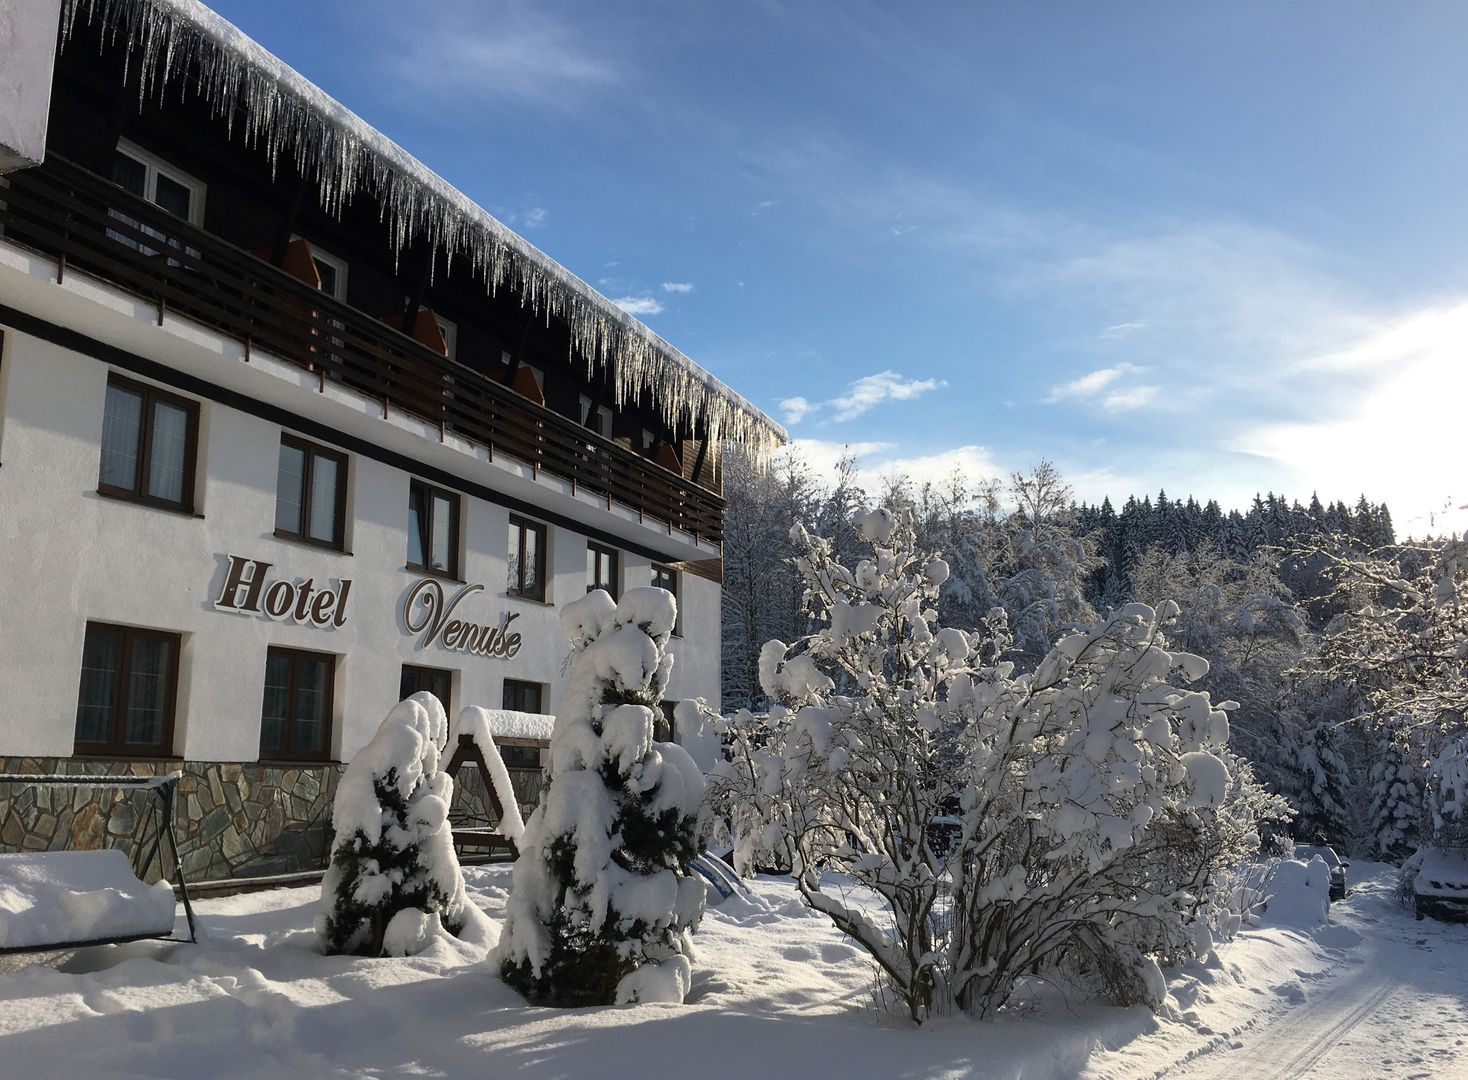 Hotel Venuse